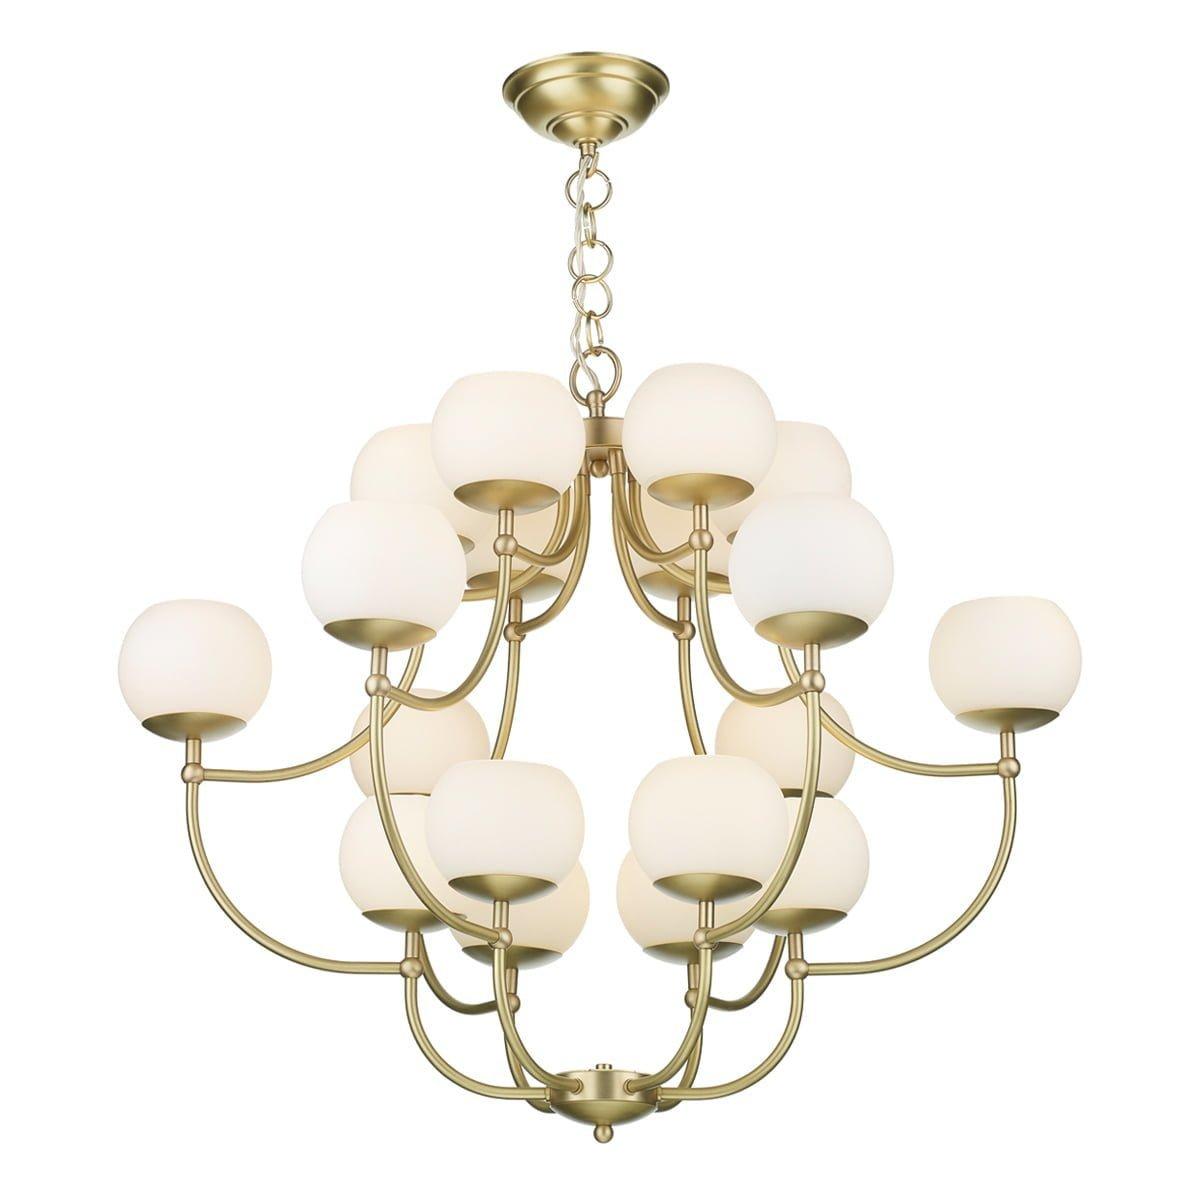 David Hunt Lighting OPE1840- Opera 18lt Multi Arm Pendant, Brushed Brass